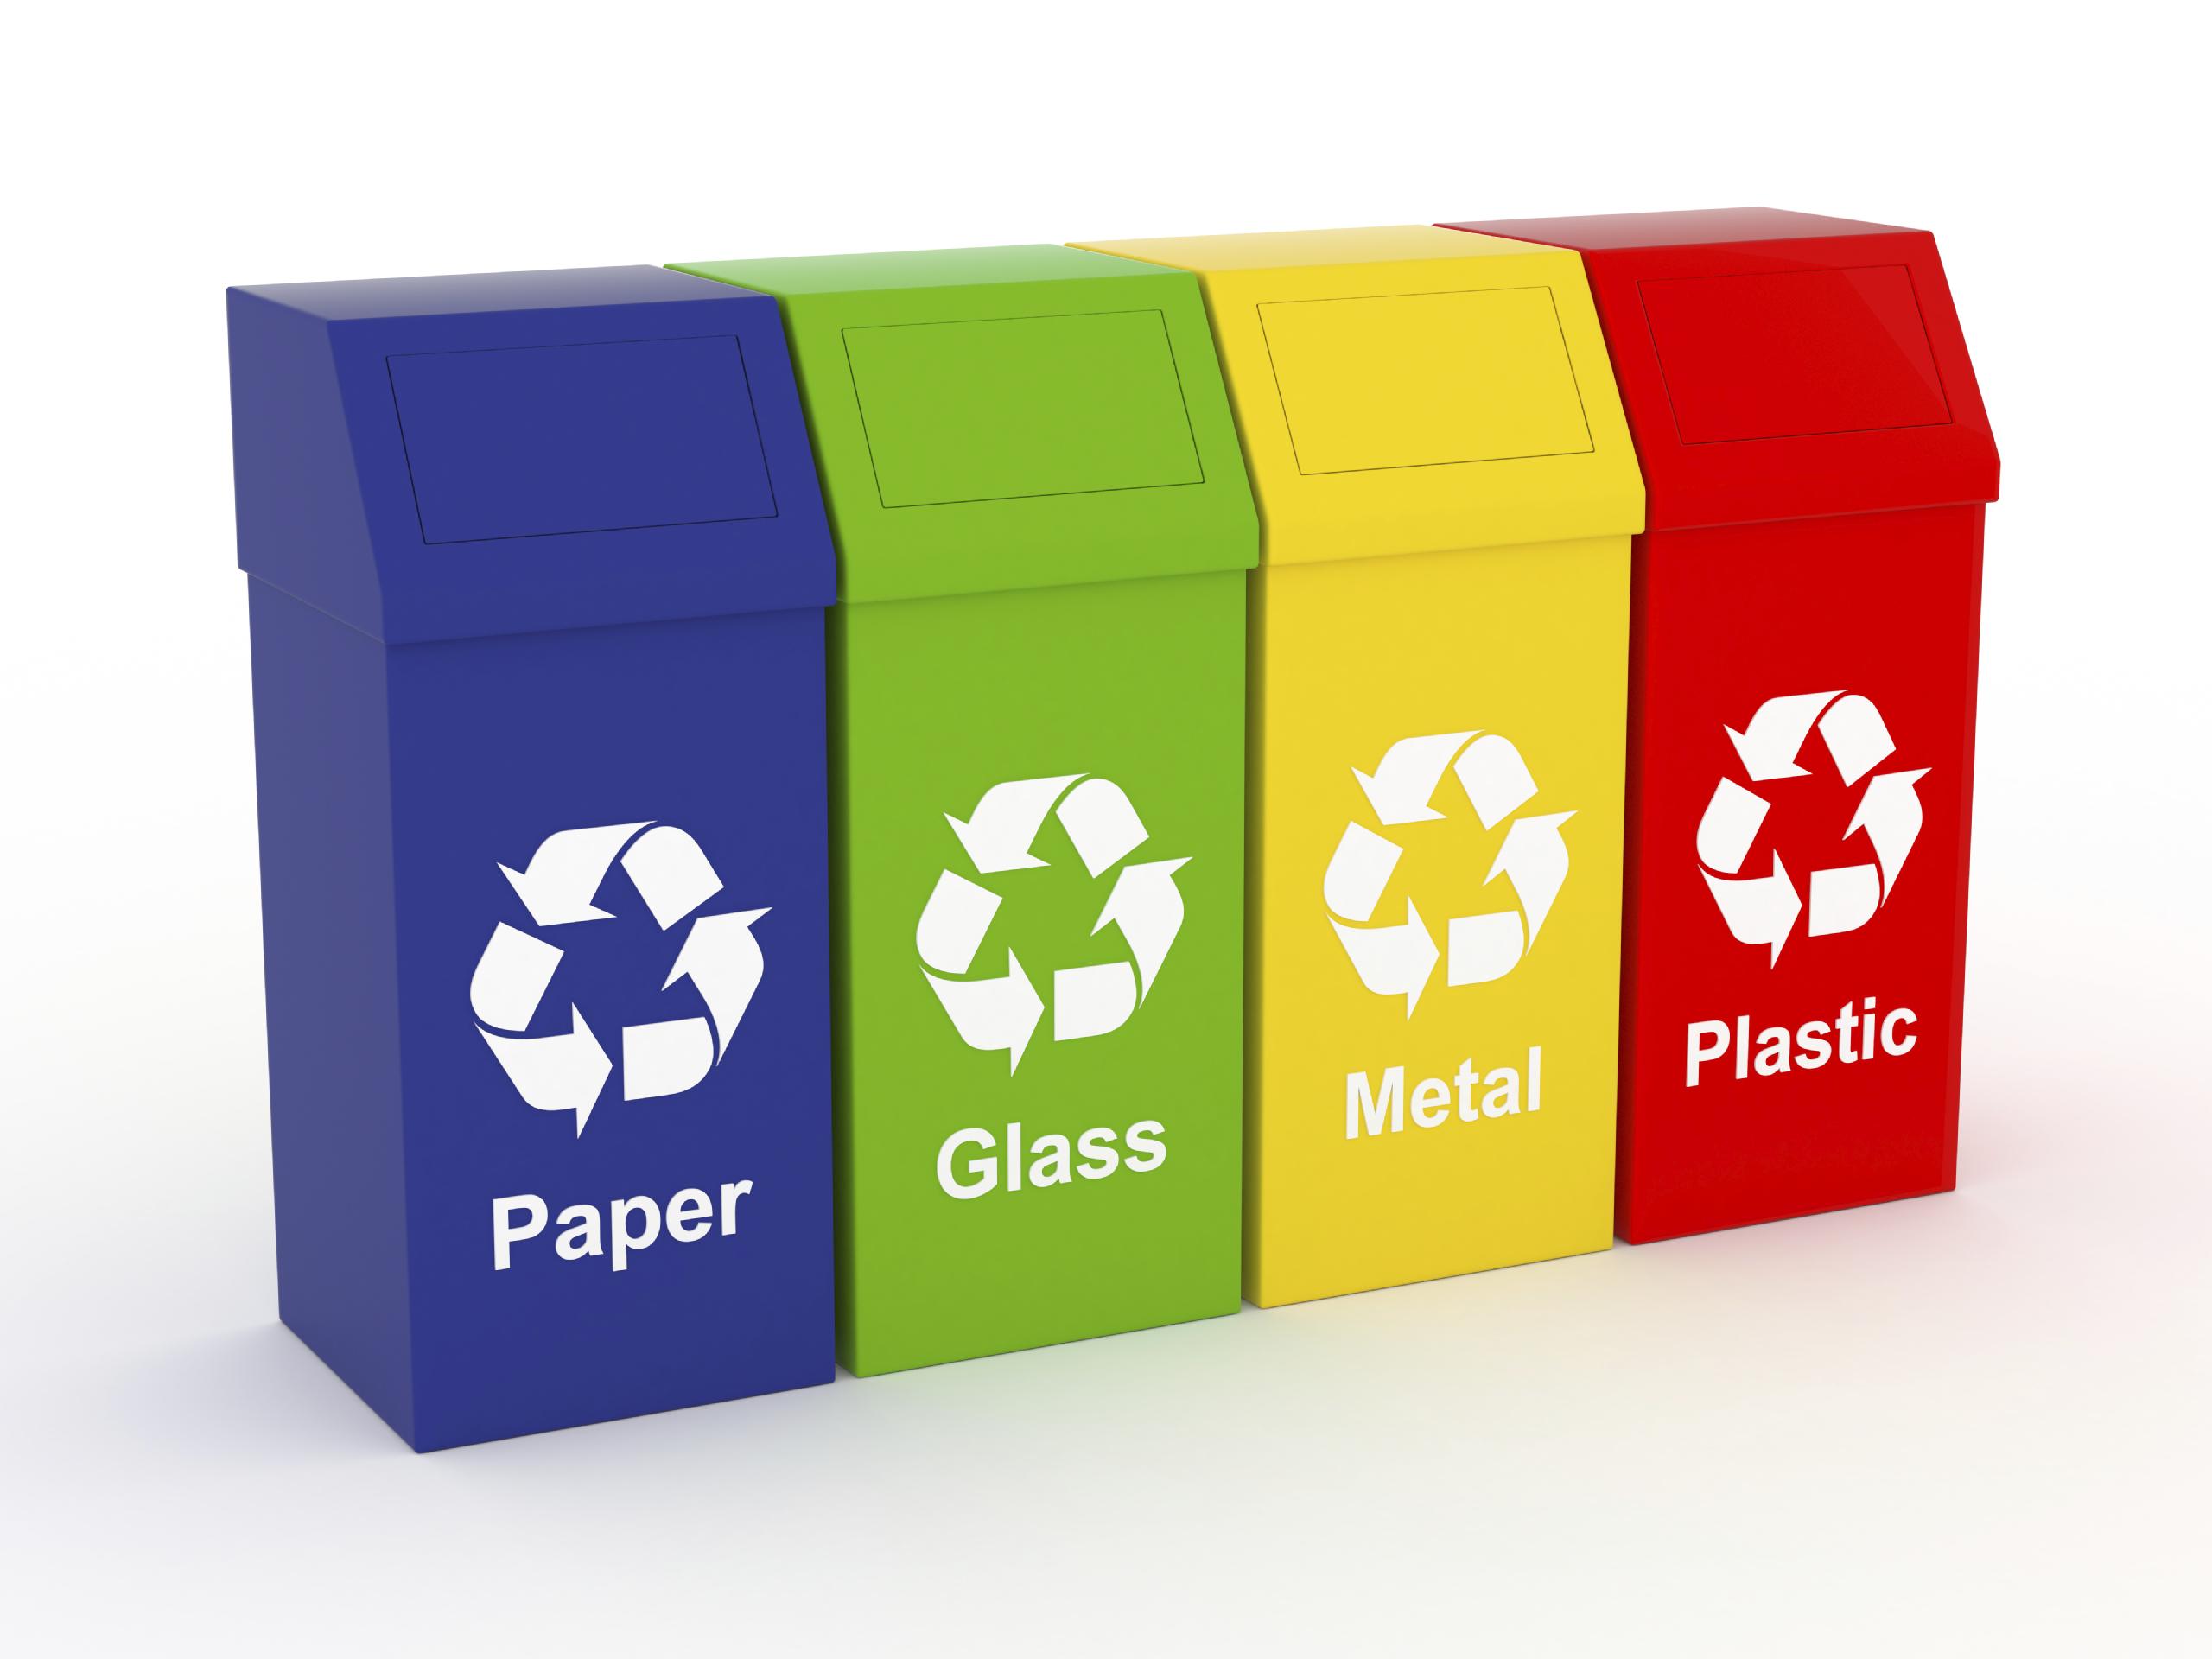 Universal Recycling